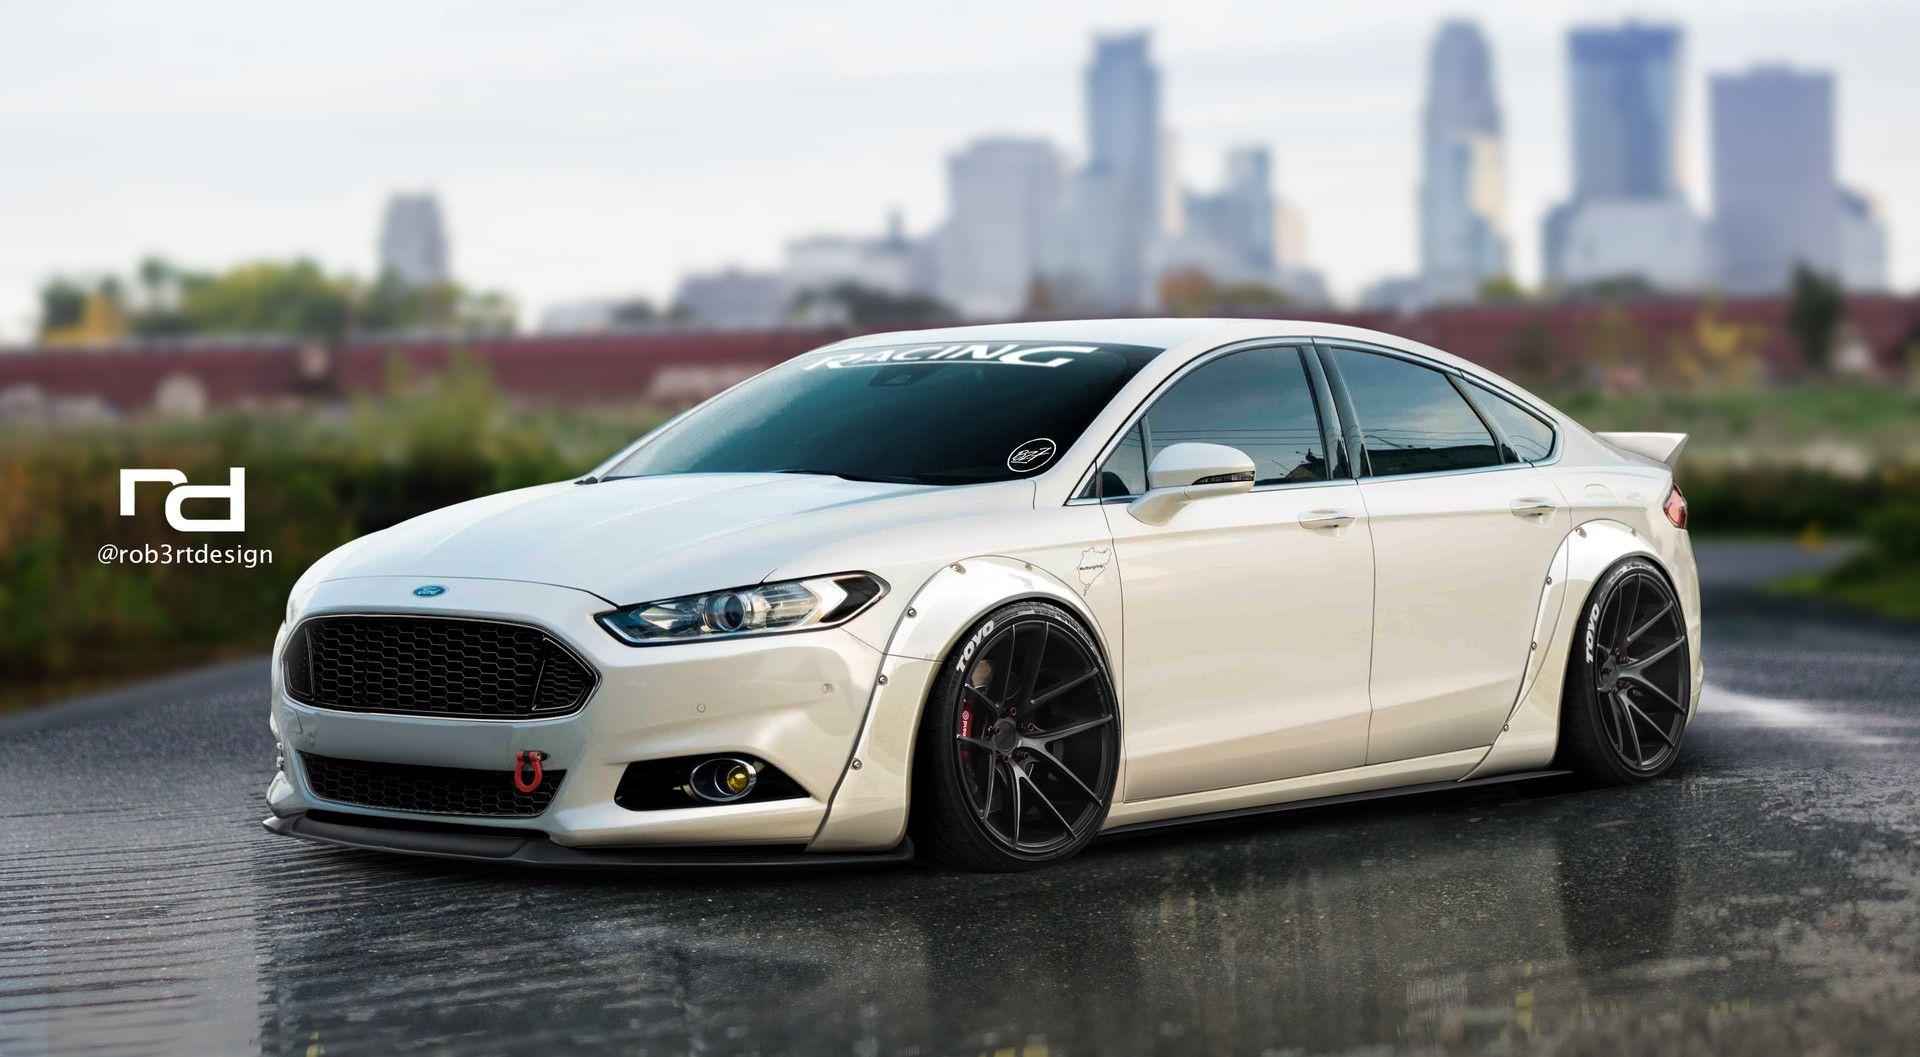 Ola Amigos Segue Meu Mais Novo Projeto Ford Fusion Rocket Bunny